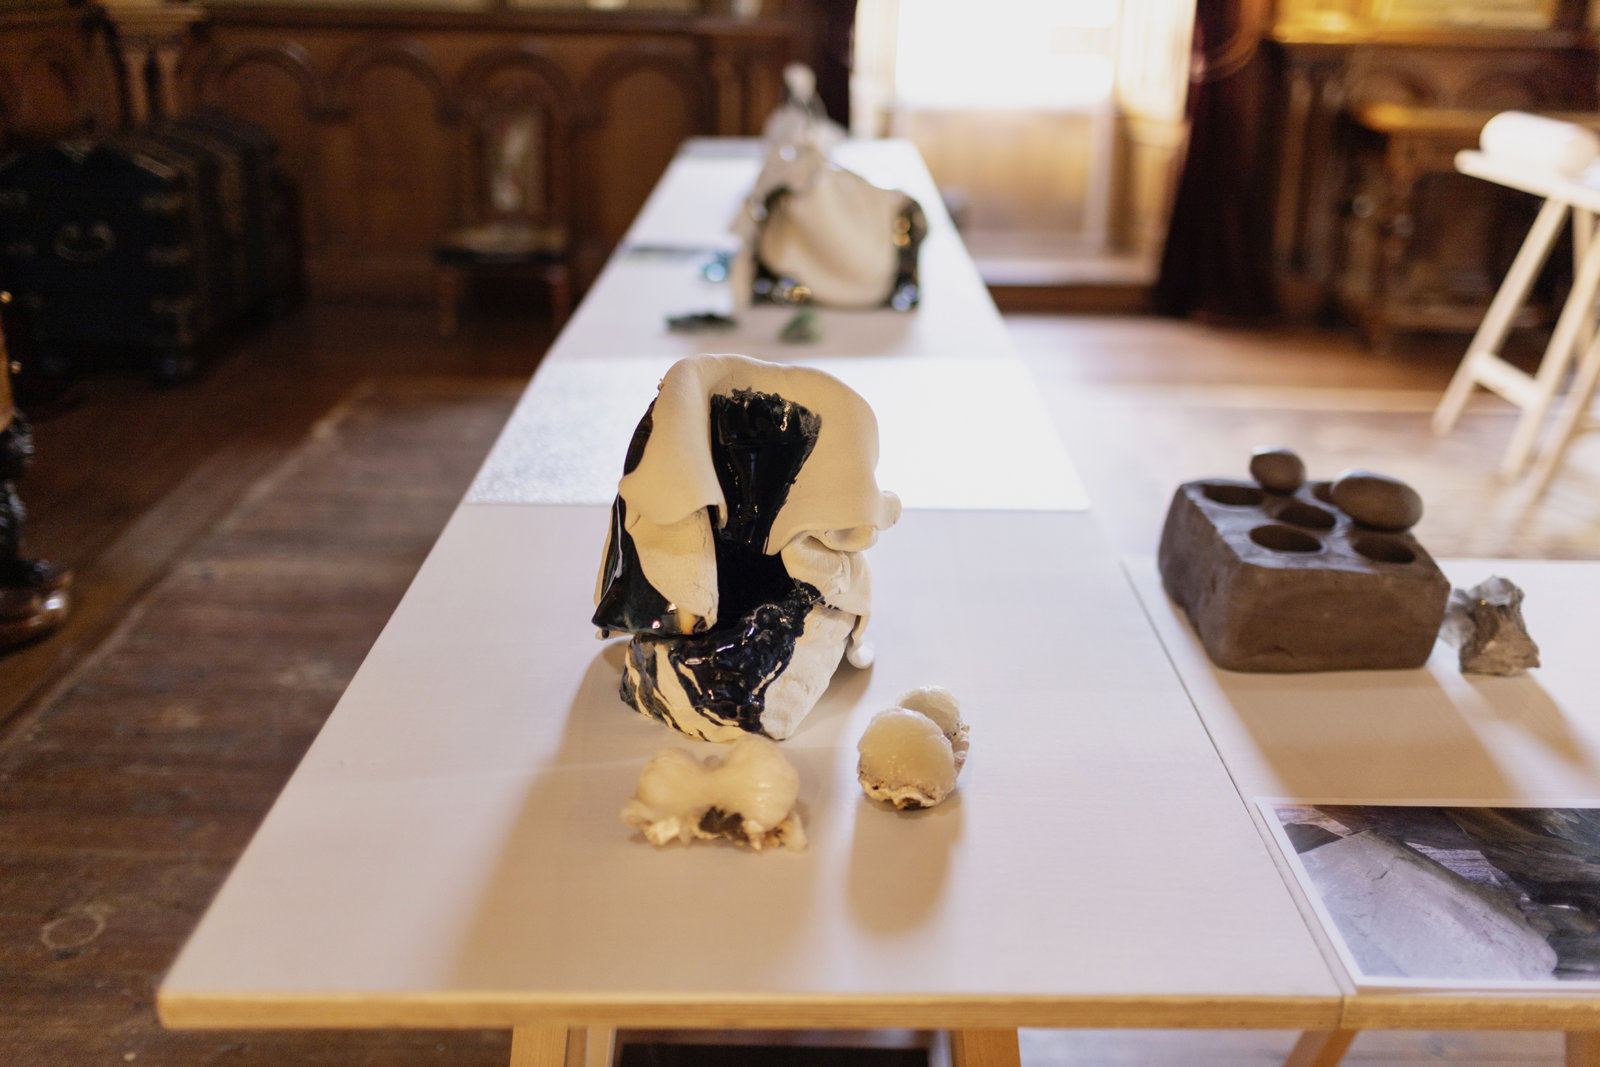 Christina Mackie, The Judges III, 2013, mixed media, dimensions variable. Installation view, The Judges III, Hospitalfield, Angus, UK, 2021 by Christina Mackie